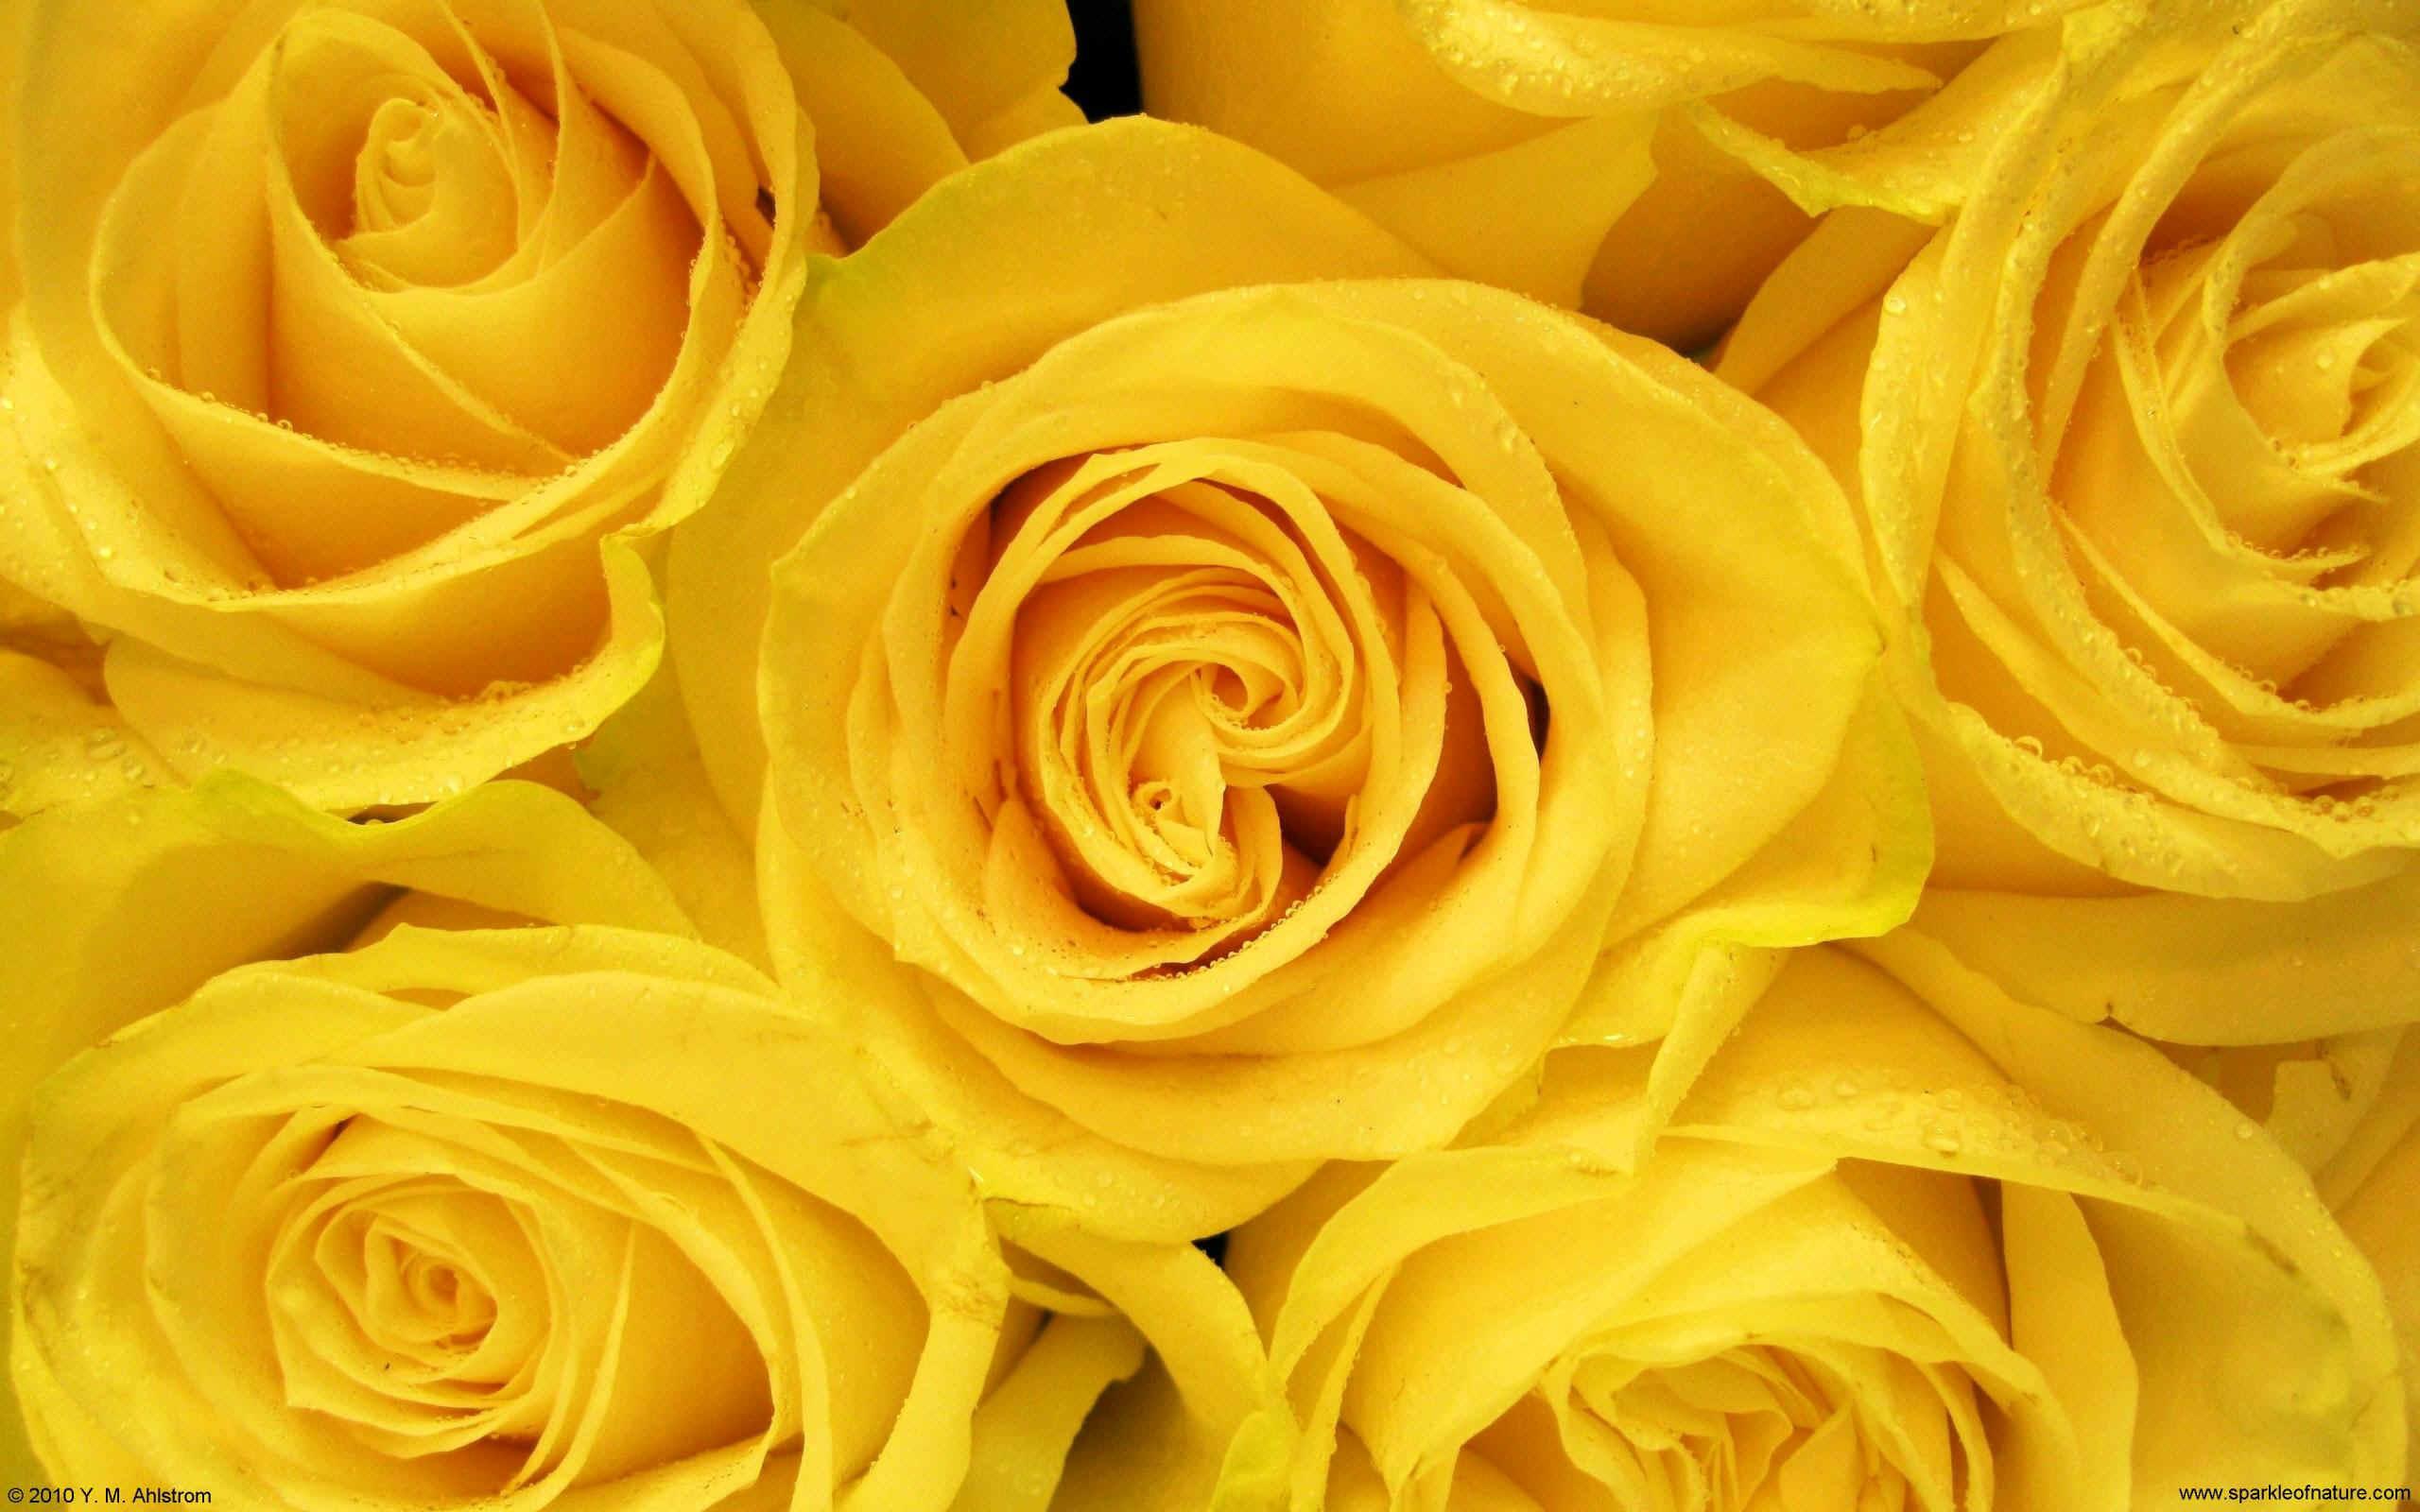 Hd wallpaper yellow rose - Yellow Rose Wallpapers Hd Wallpapers 0 Html Code Free Desktop Wallpapers Flowers 20472 2560x1600